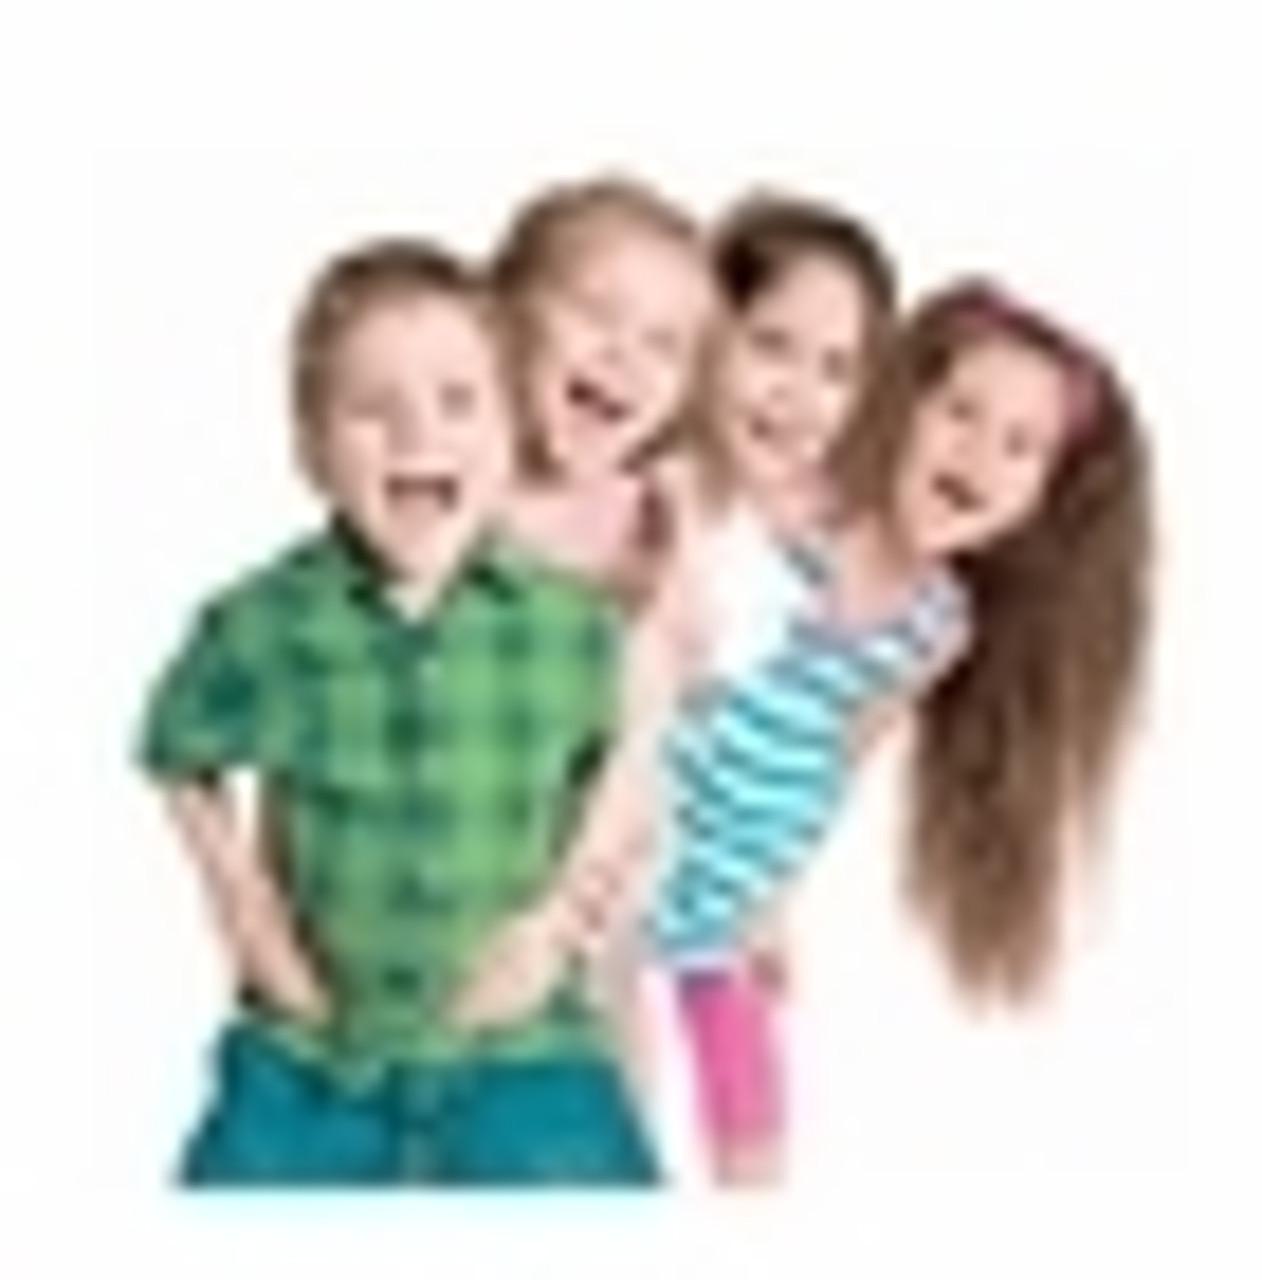 Orthopedic Shoes For Kids | Kids Orthopedic Shoes